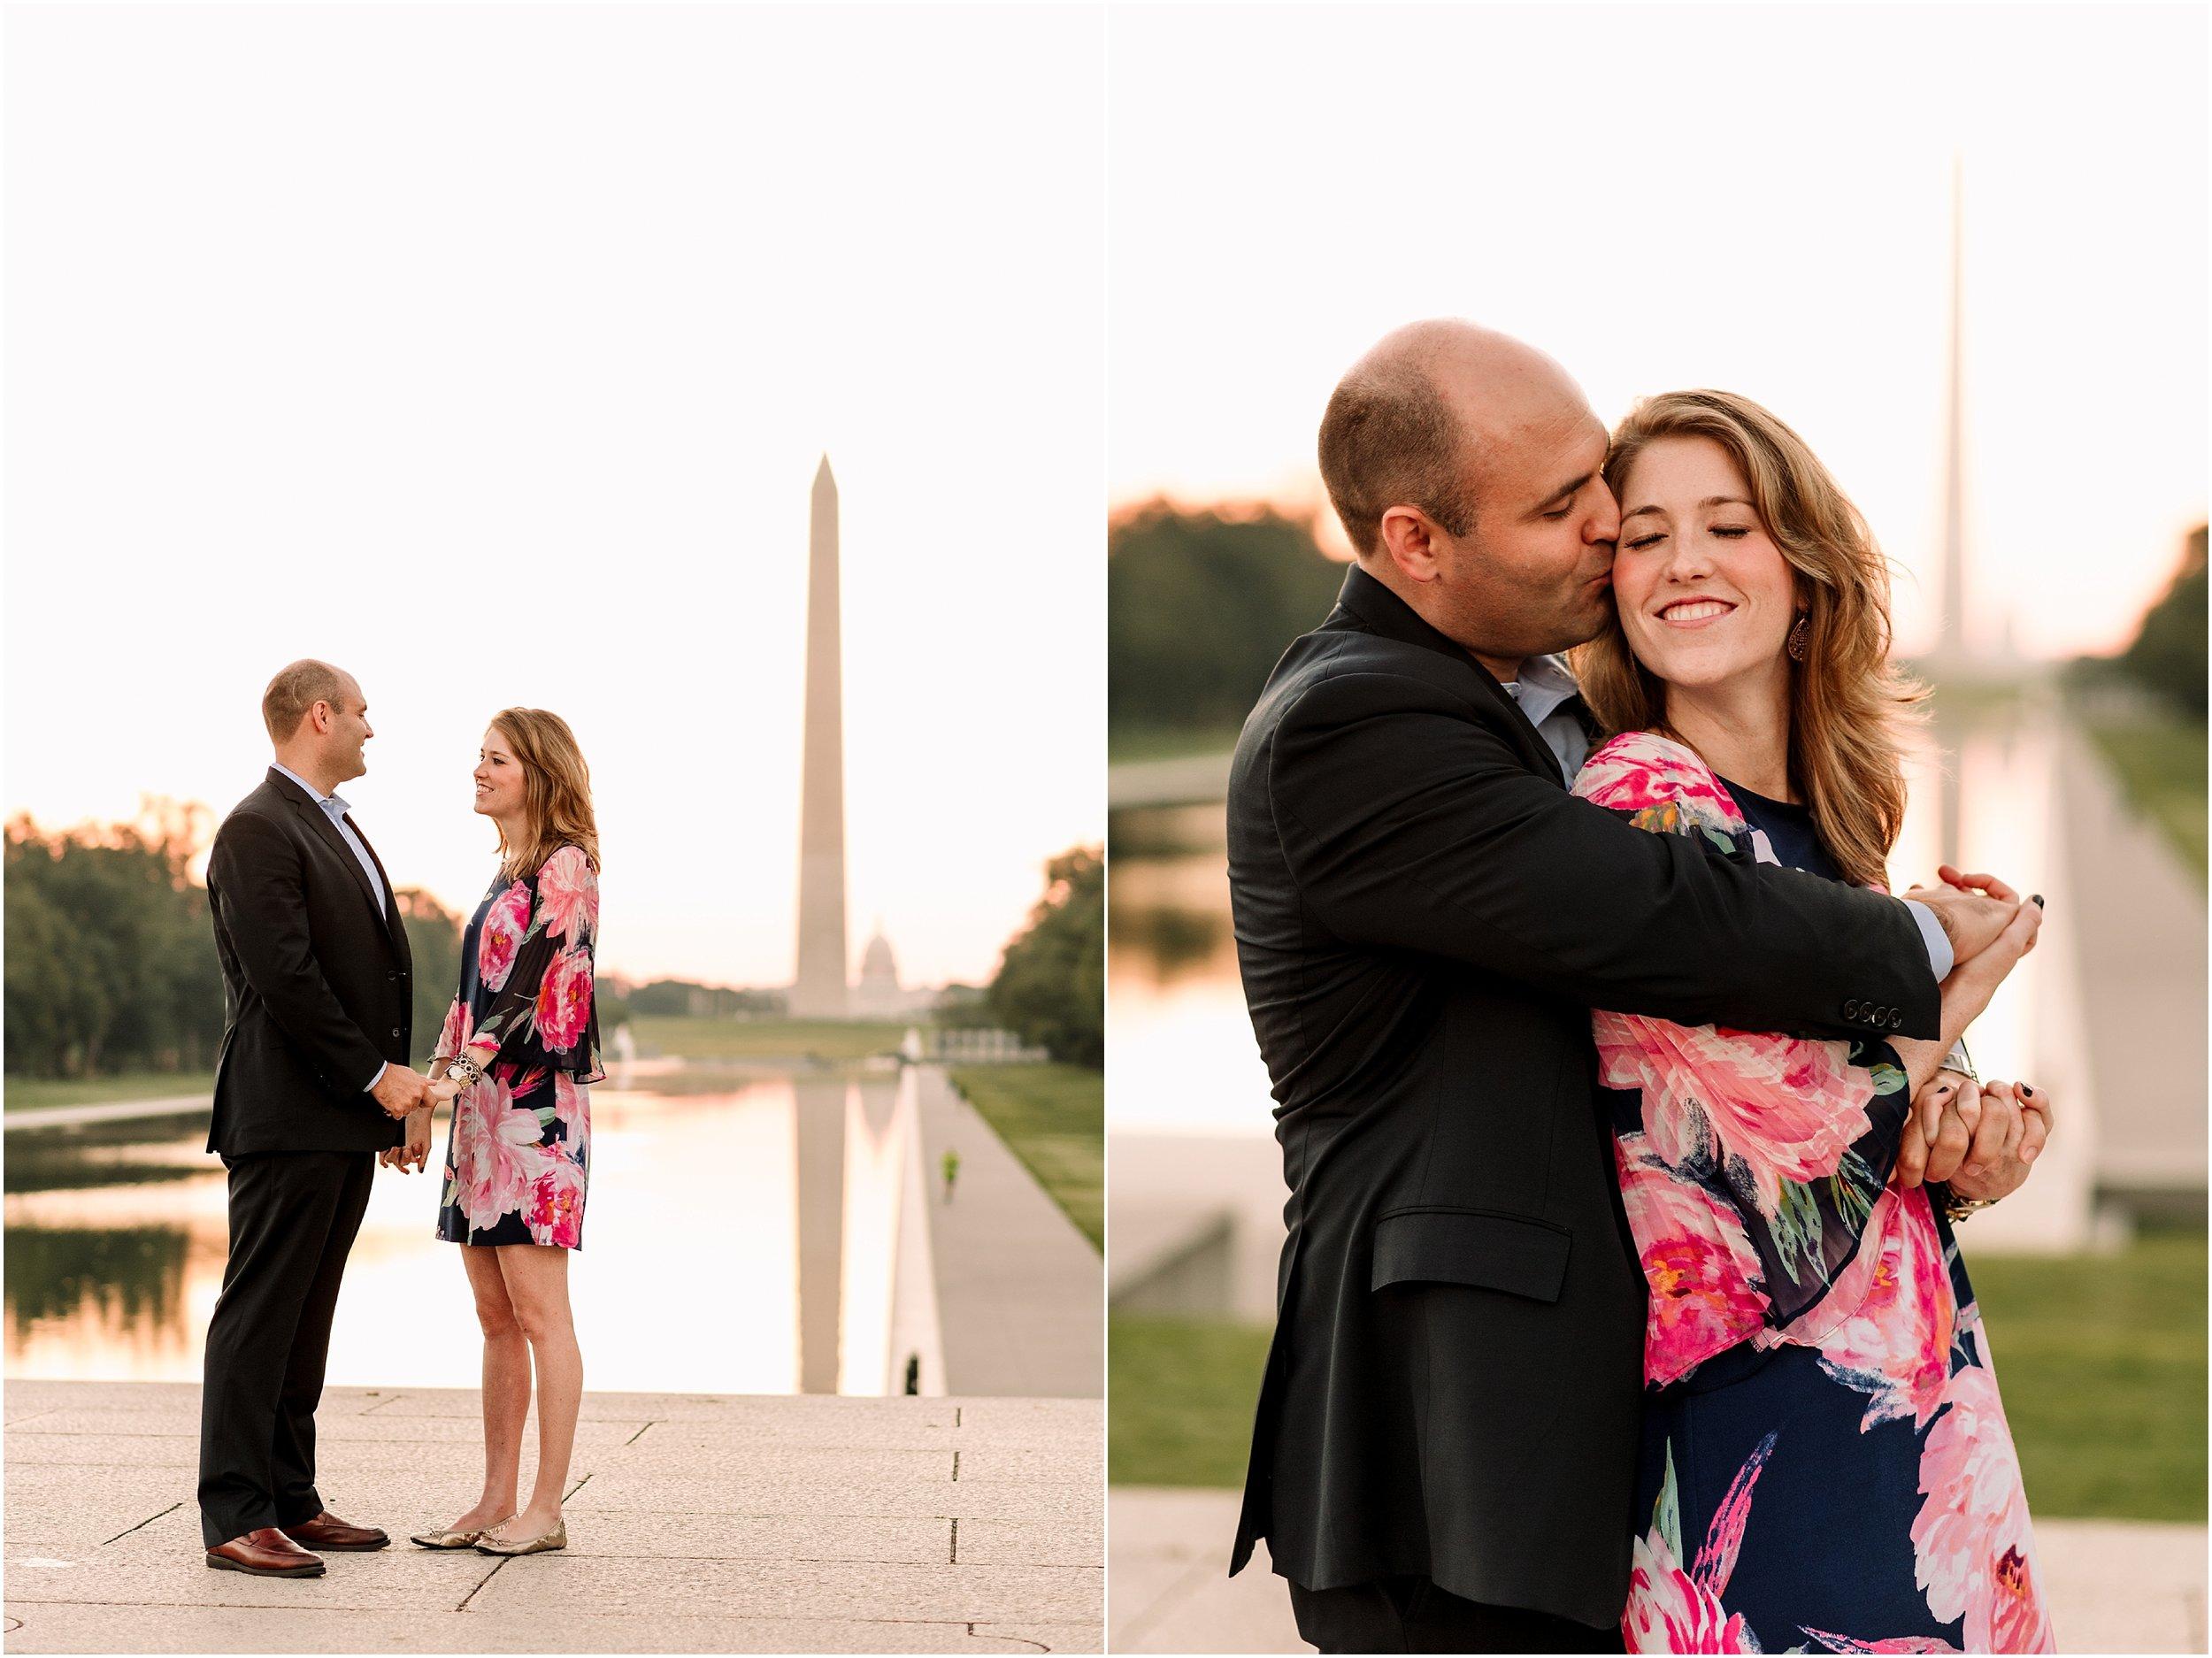 hannah leigh photography Sunrise Jefferson Memorial Engagement Session, Washington DC_1005.jpg